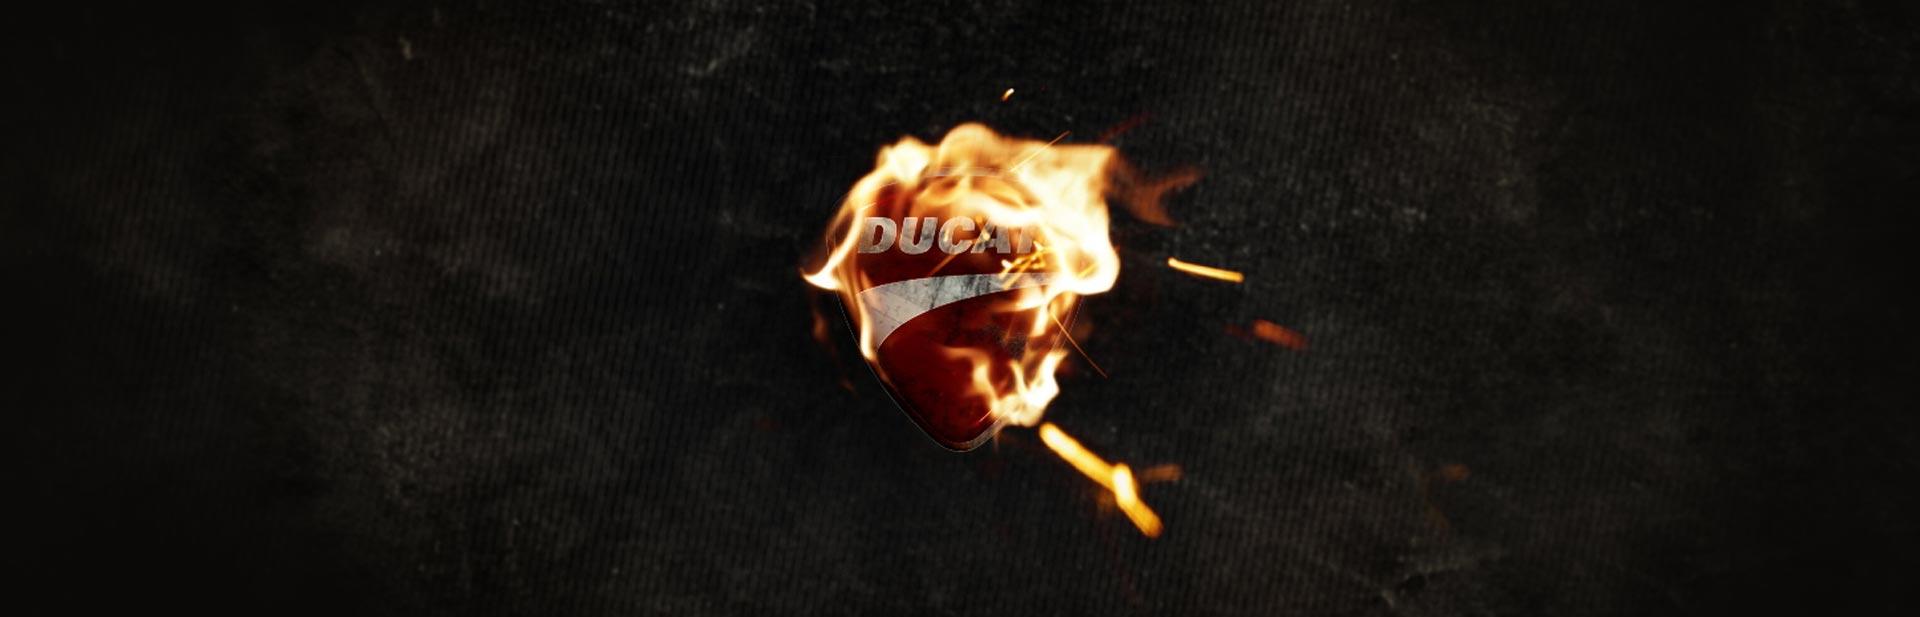 H-Ducati_01